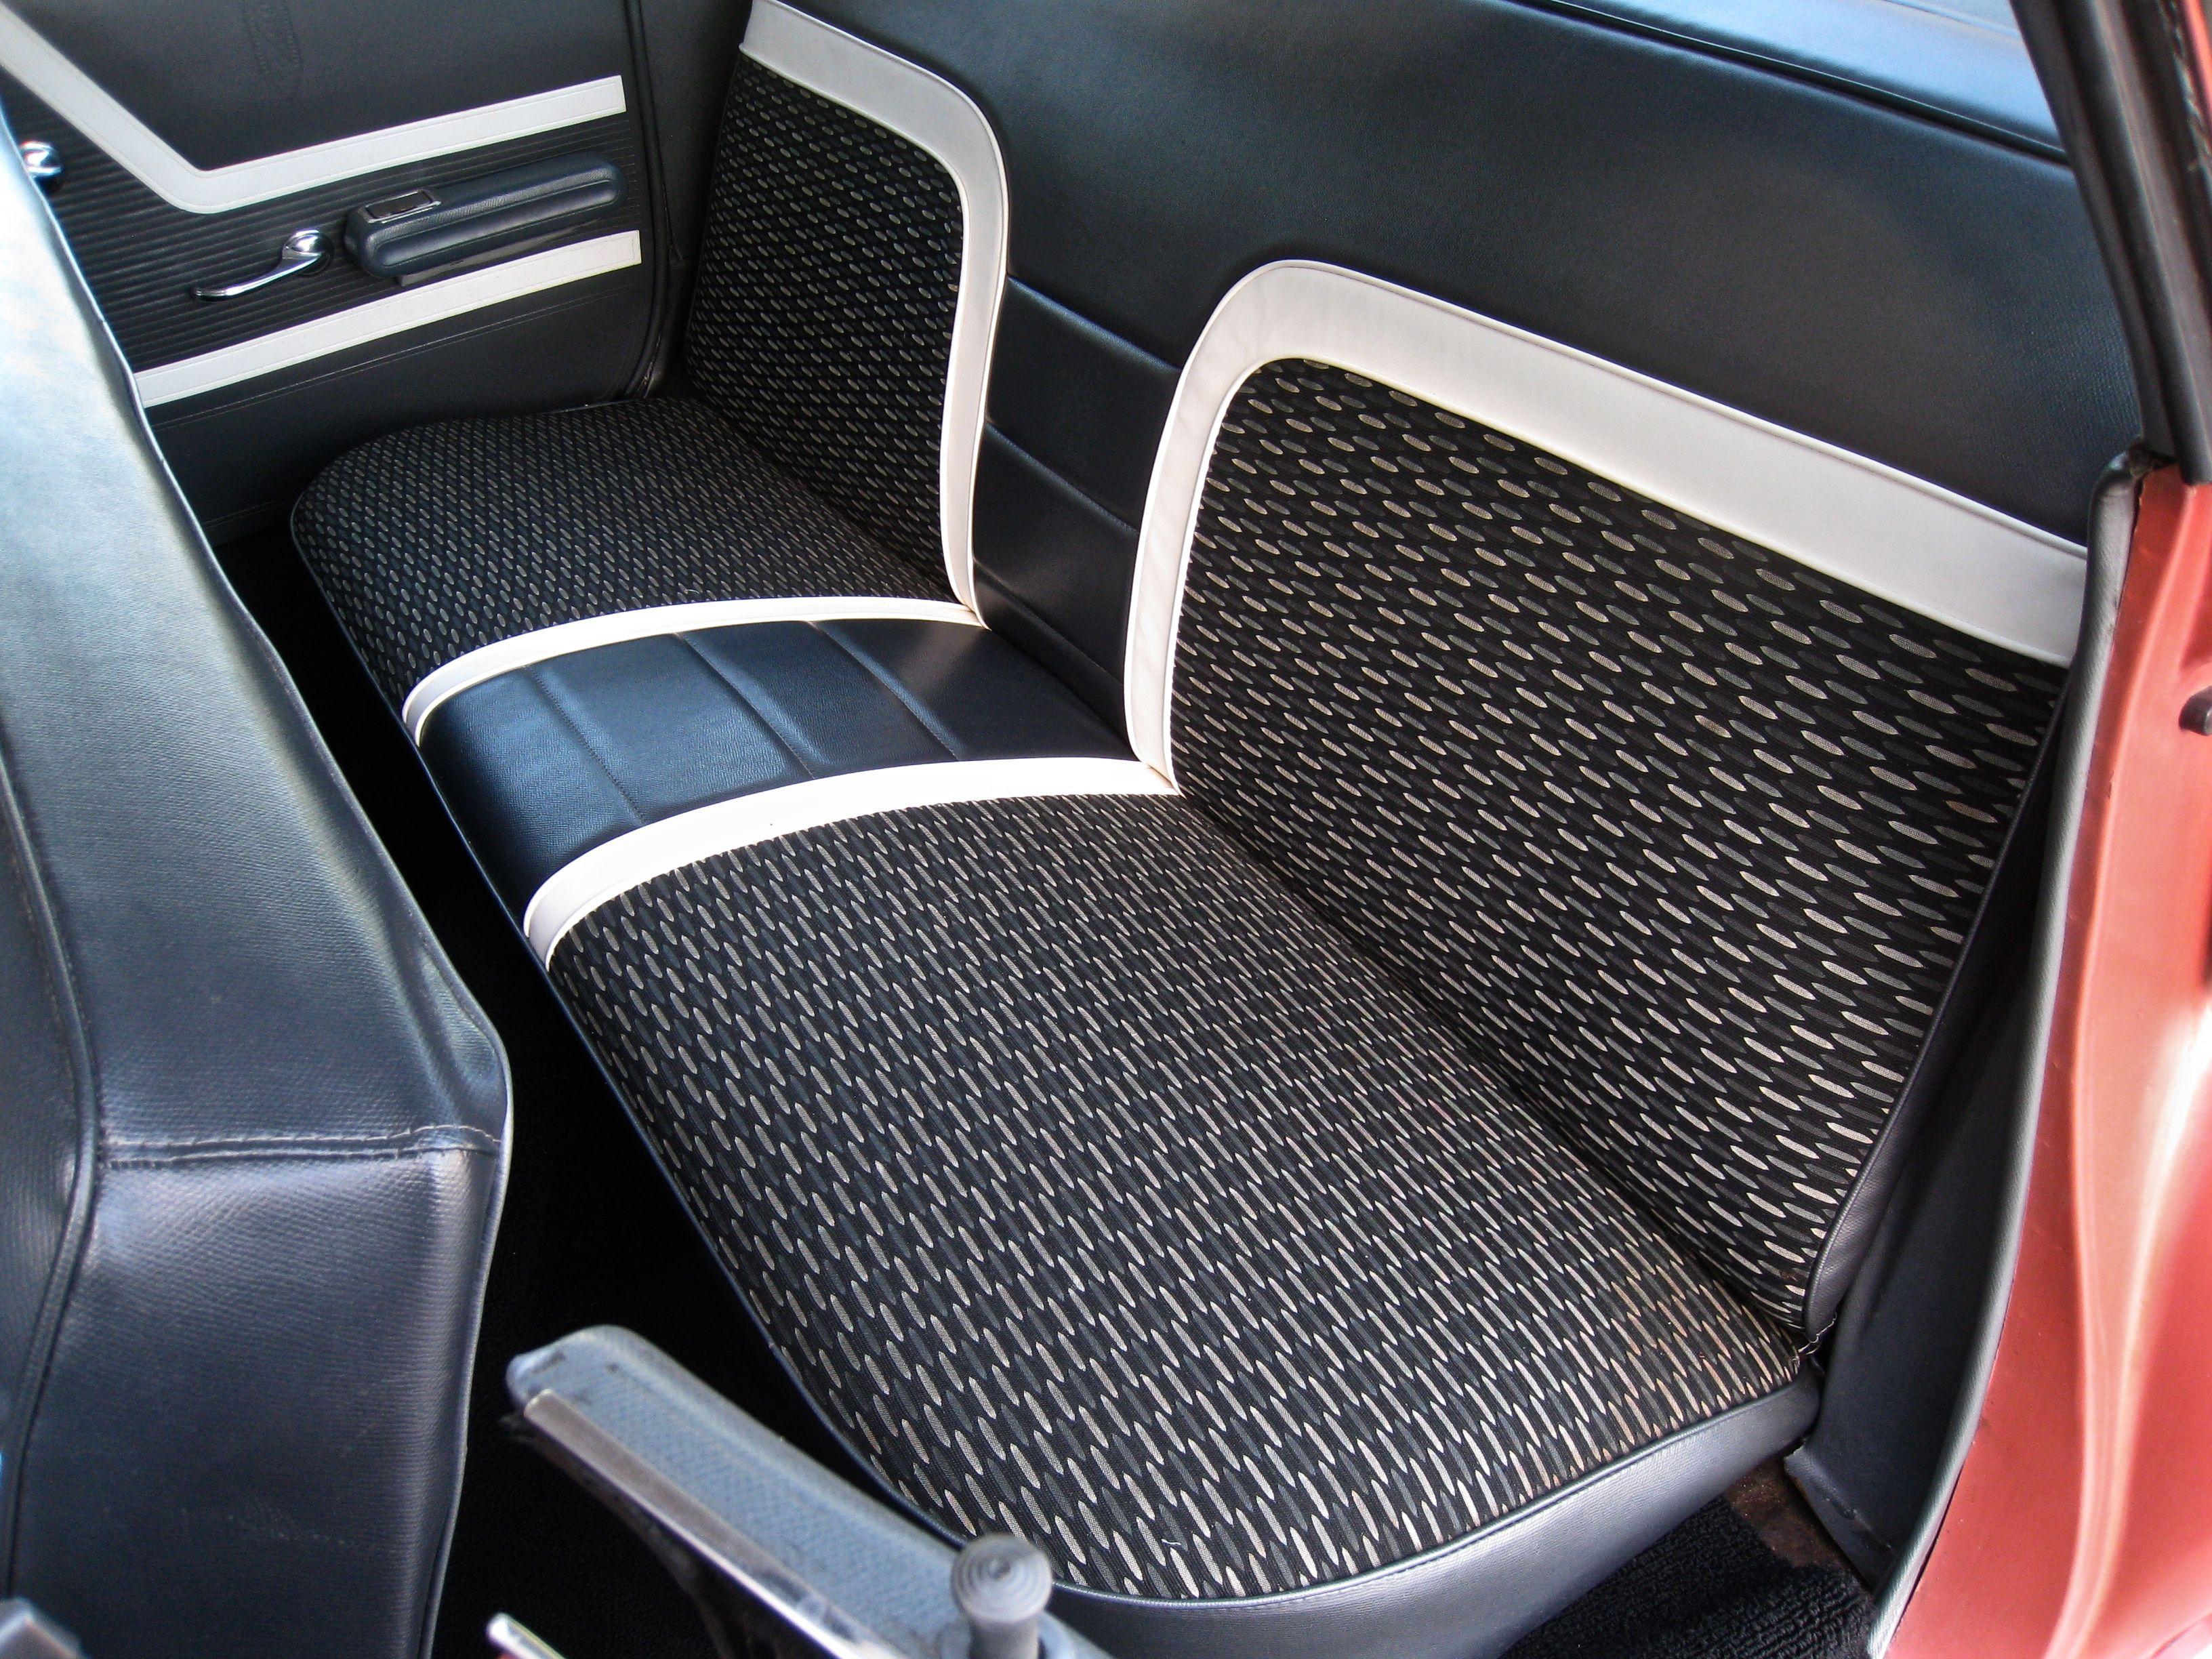 1959 Buick Lesabre Unrestored Totally Original Interior Of A California Car